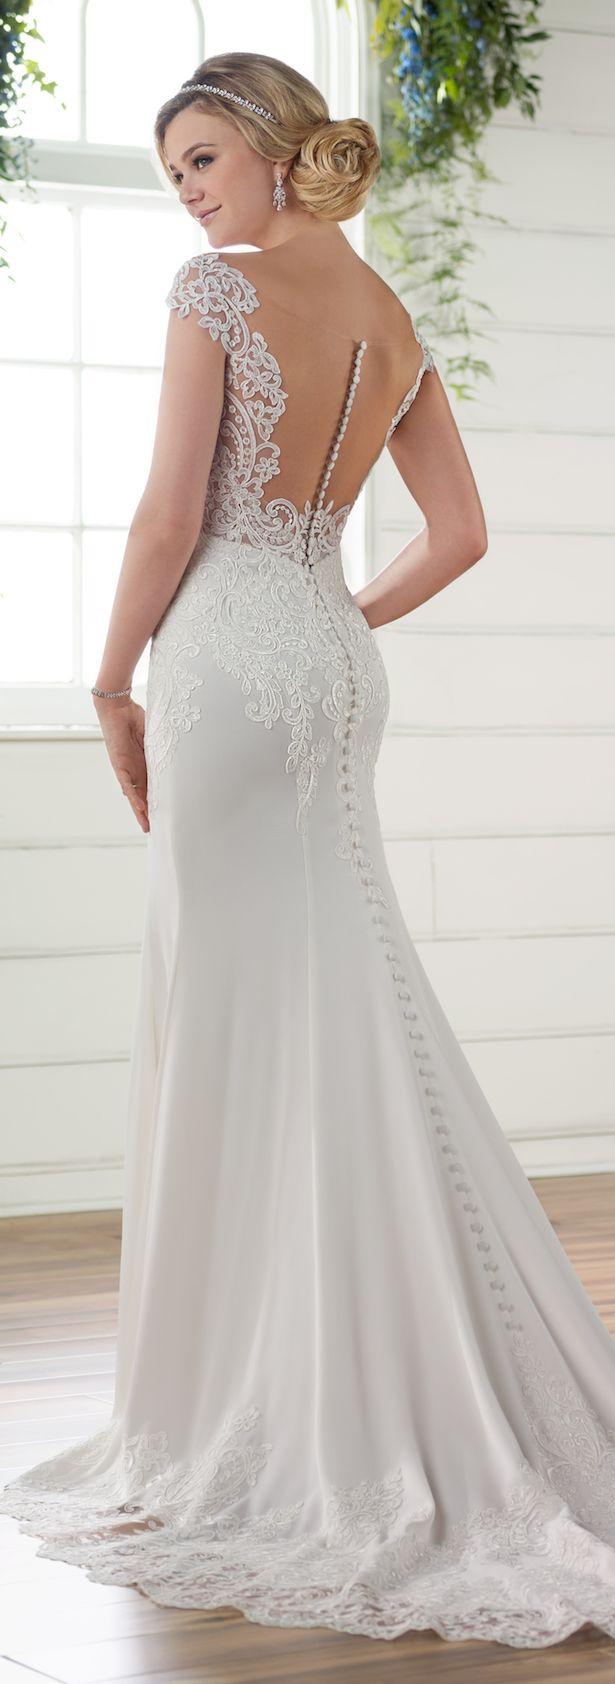 Best 25+ Petite wedding dresses ideas on Pinterest | Petite bride ...